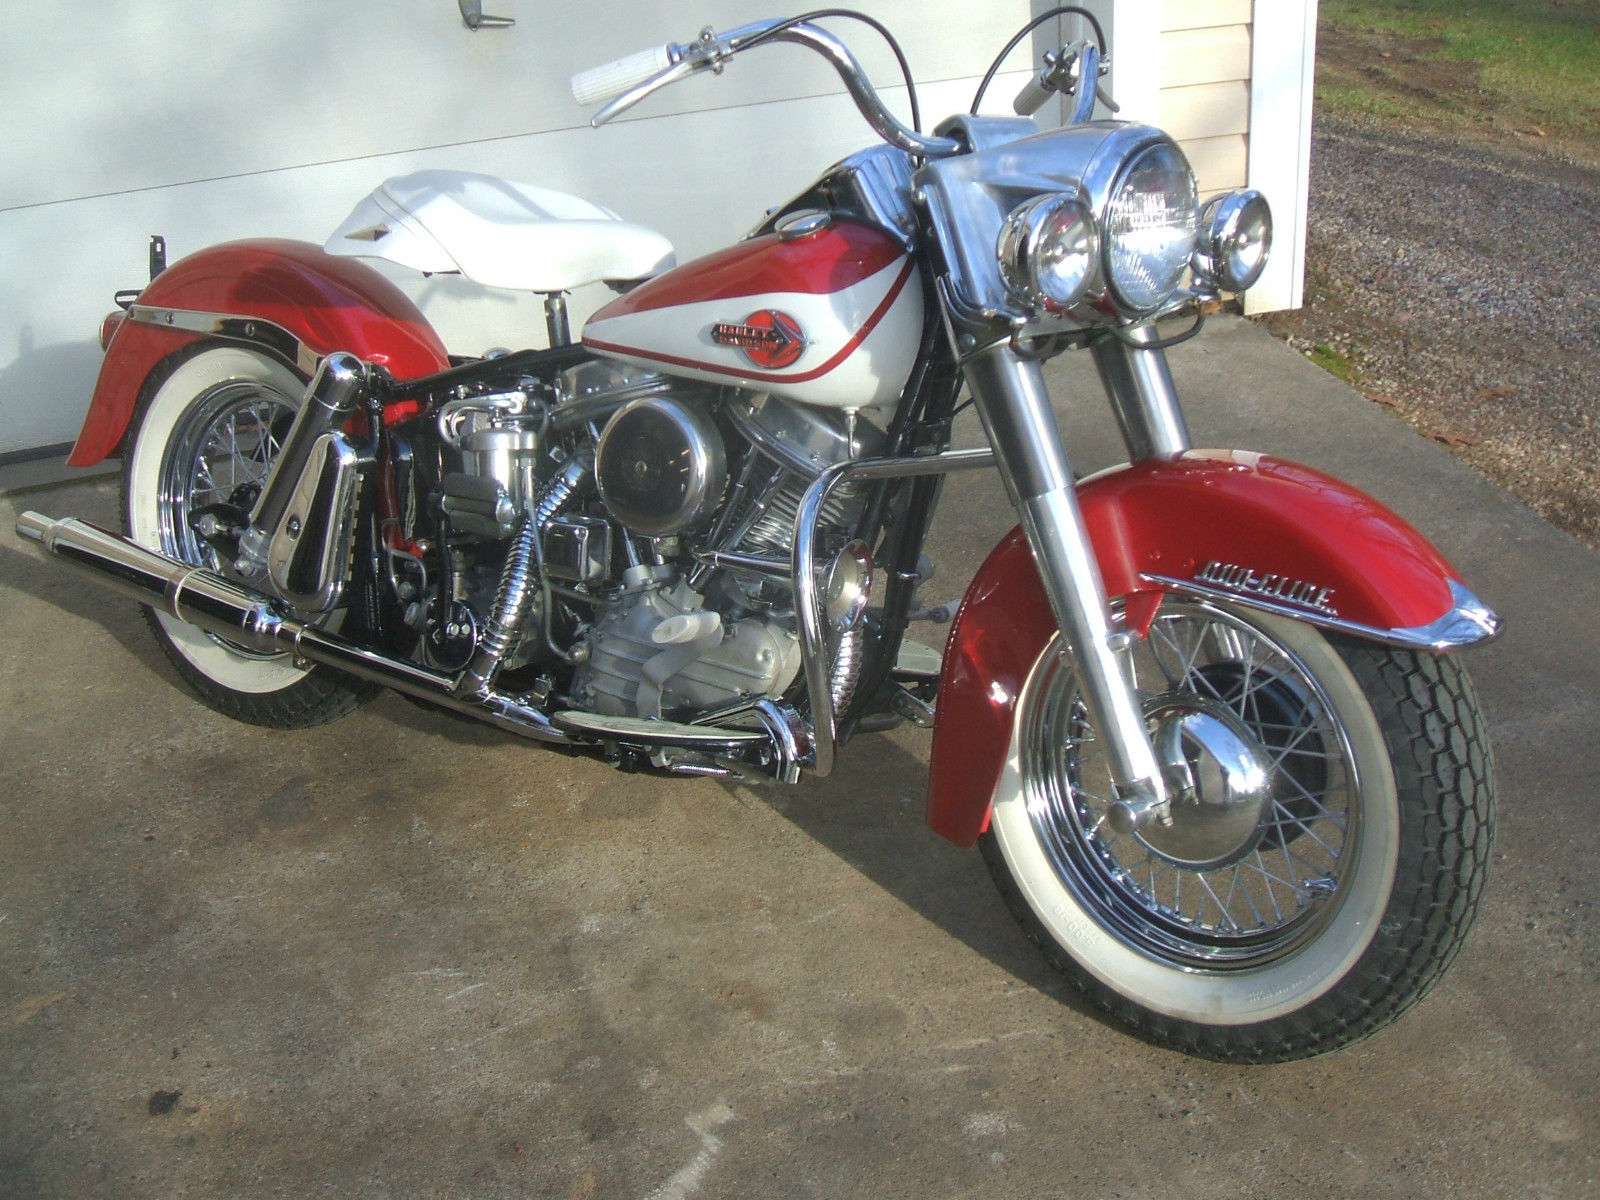 Harley-Davidson Panhead - 1960 - Frame, Wheels, Fuel Tank, Handlebars and Grips.